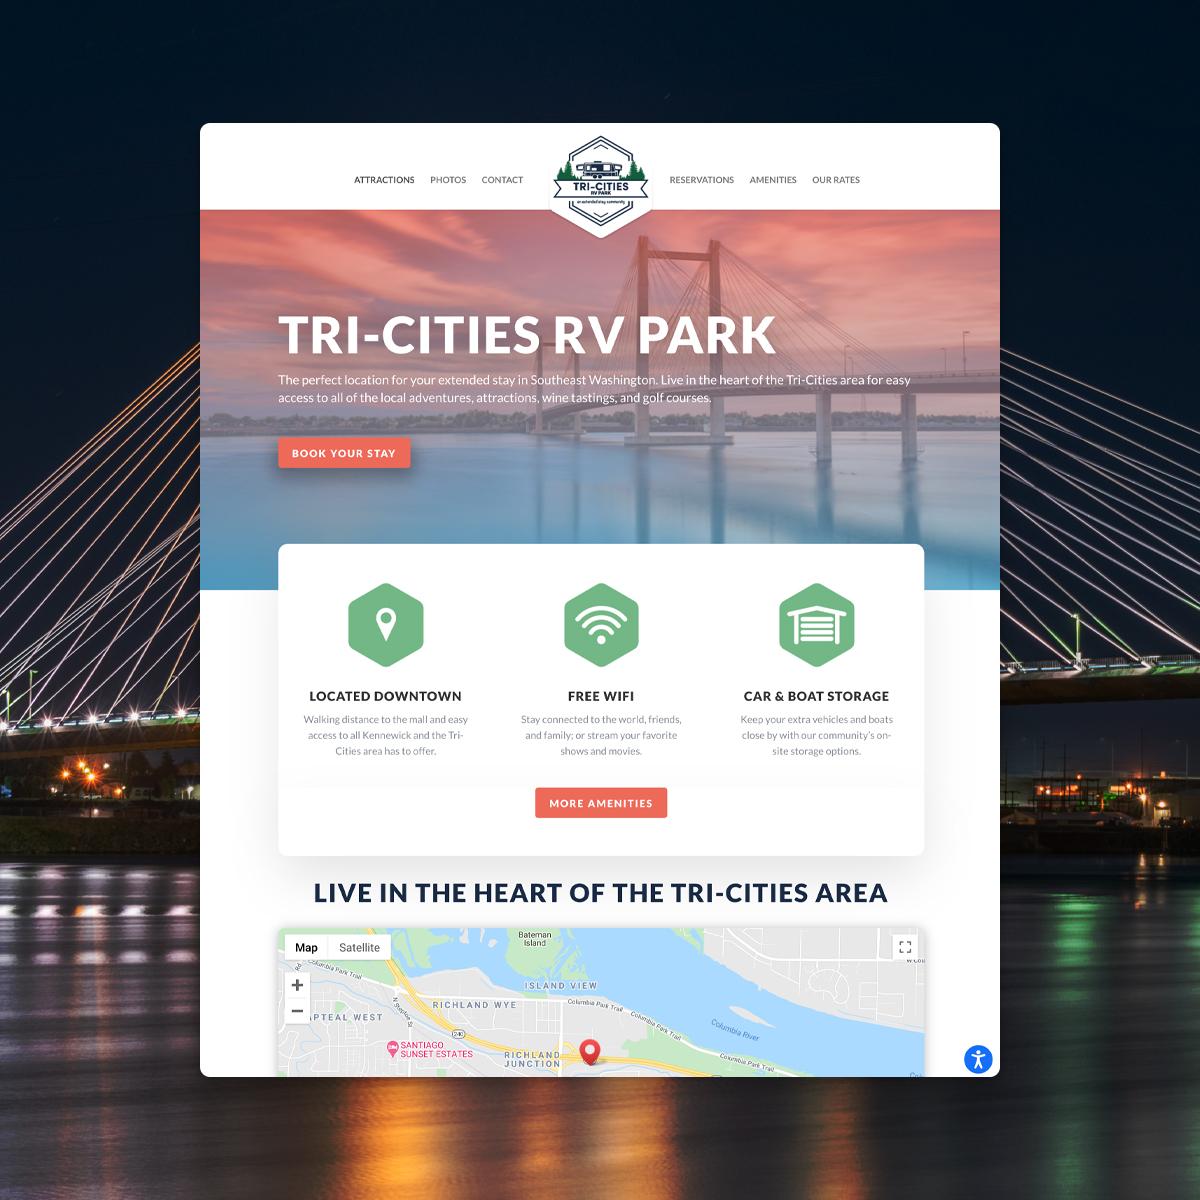 Tri-Cities RV Park